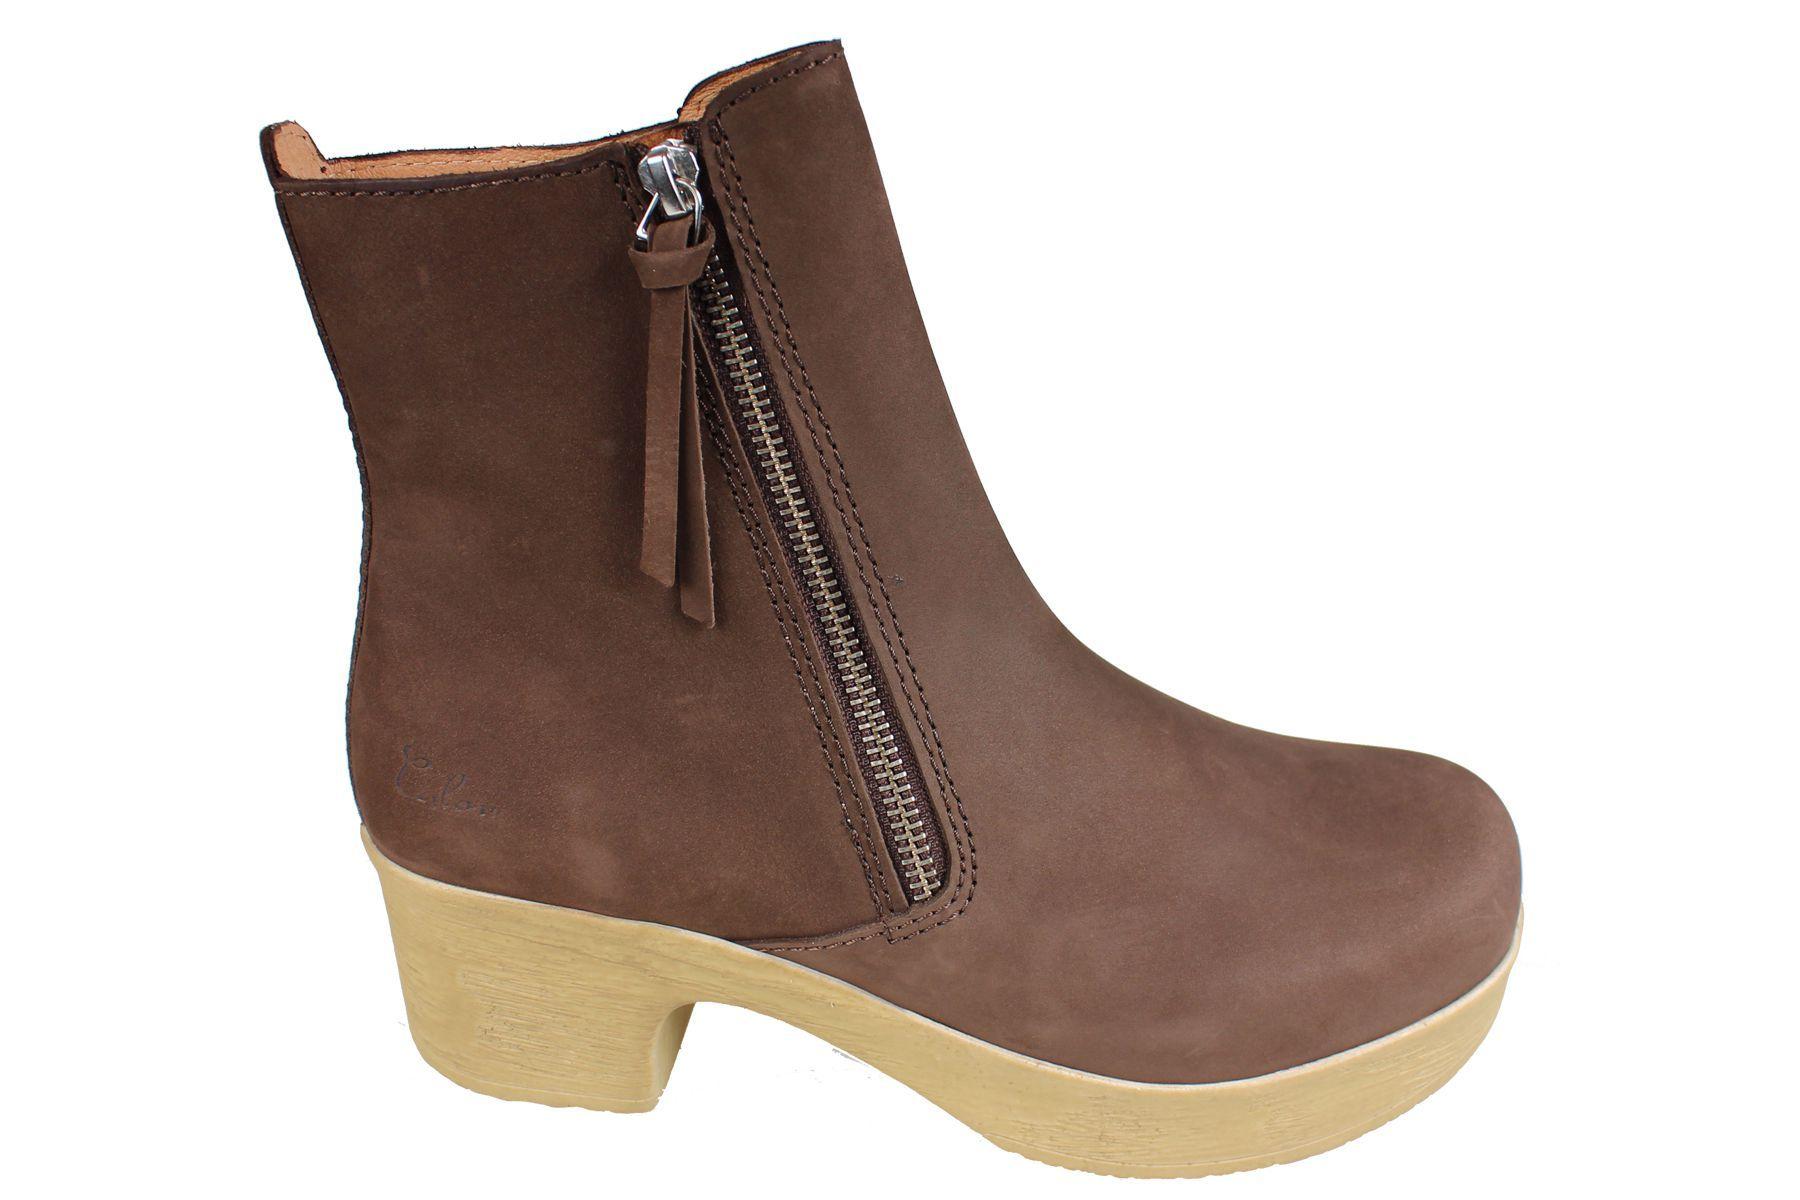 Calou Moa Boot in Brown Nubuck